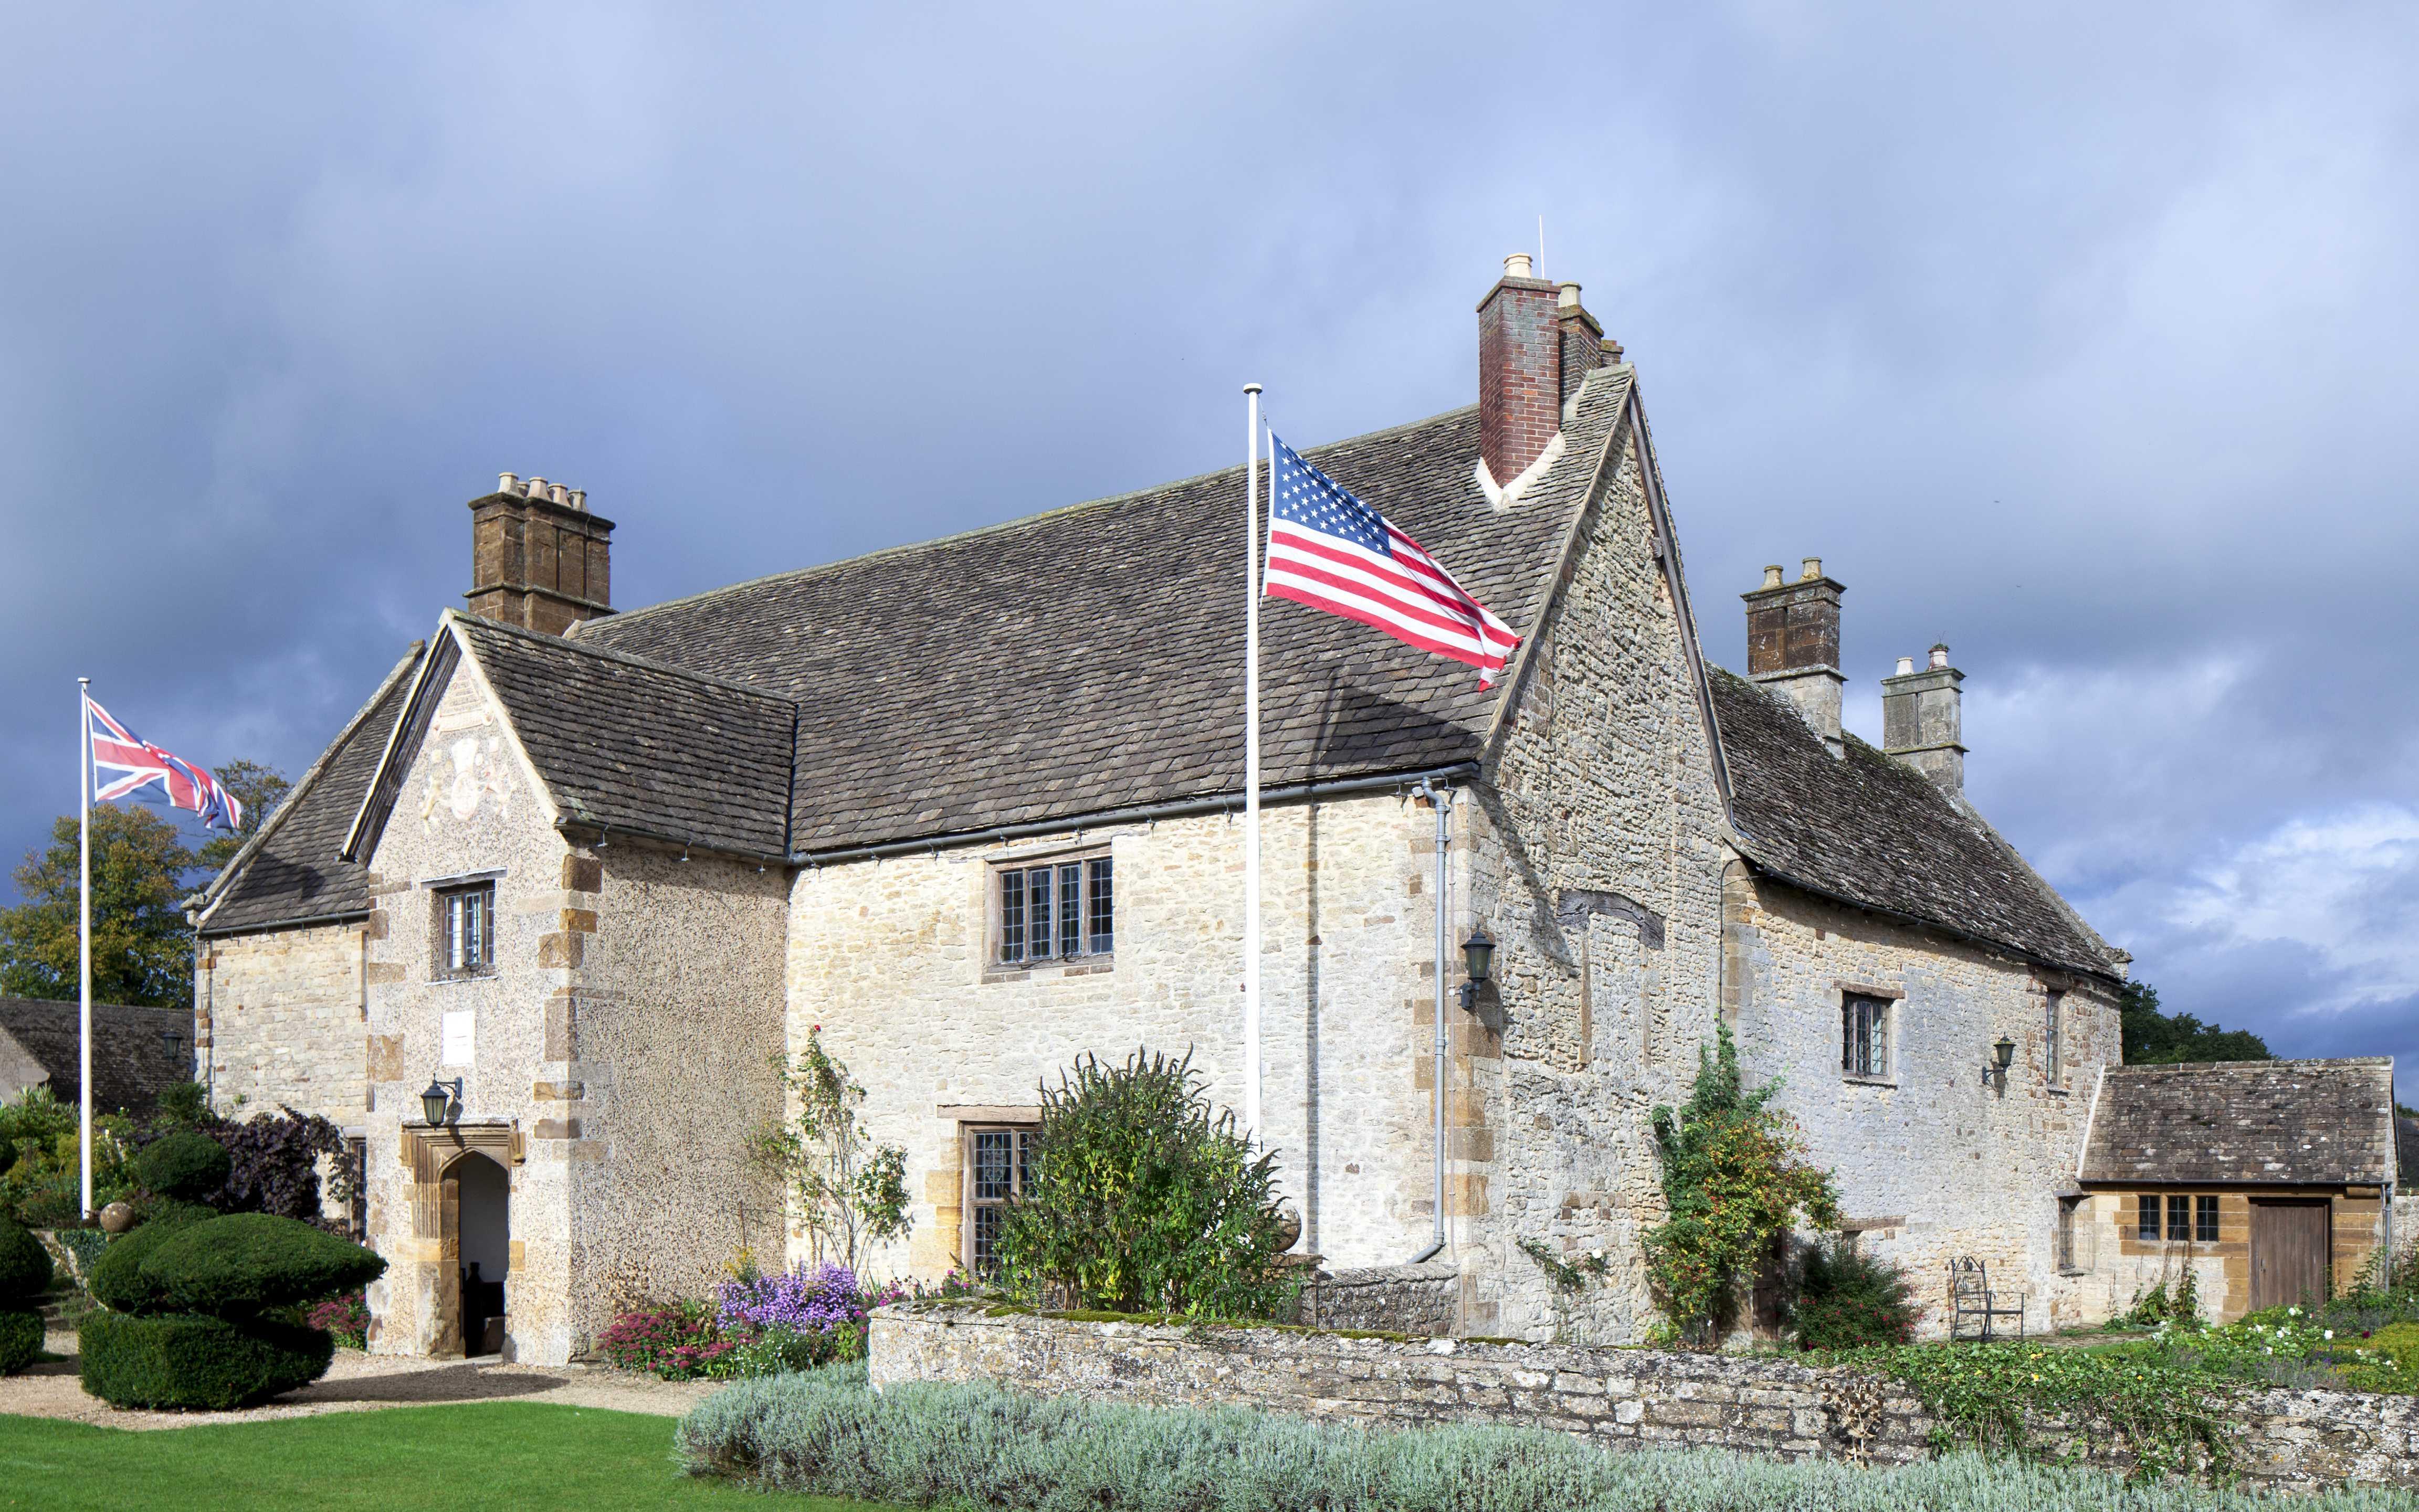 Sulgrave Manor, Banbury, Northamptonshire, England